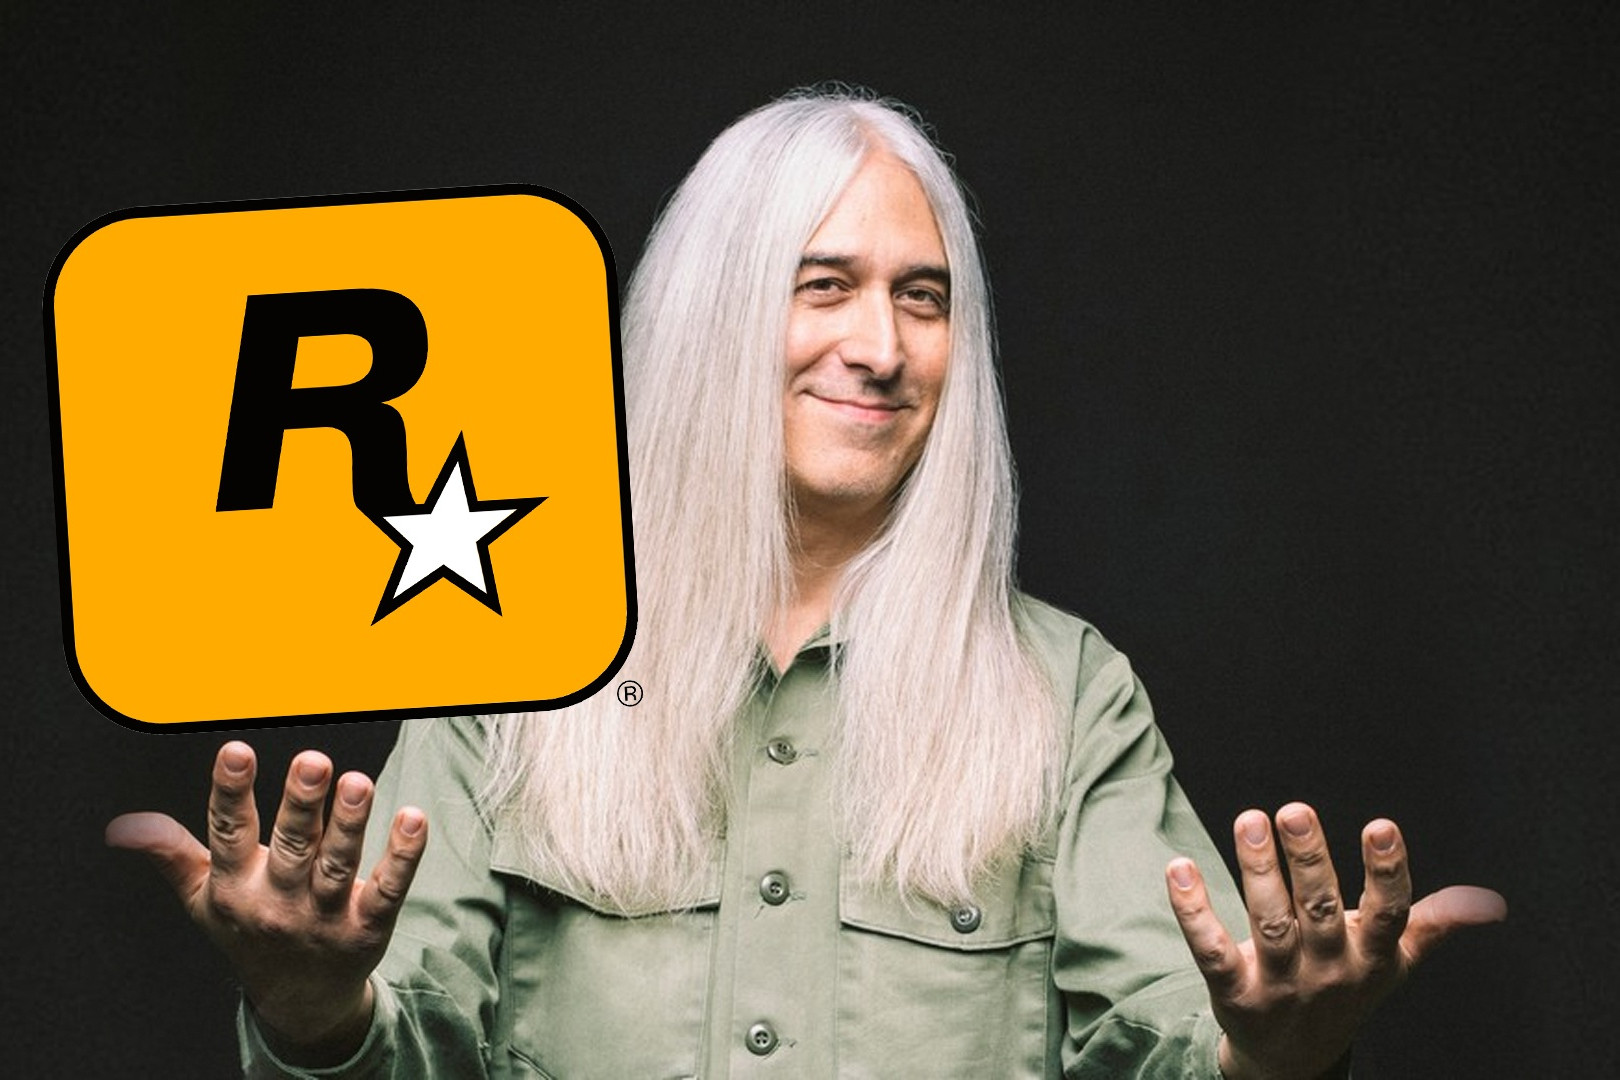 Shawn Lee Procès Rockstar Games